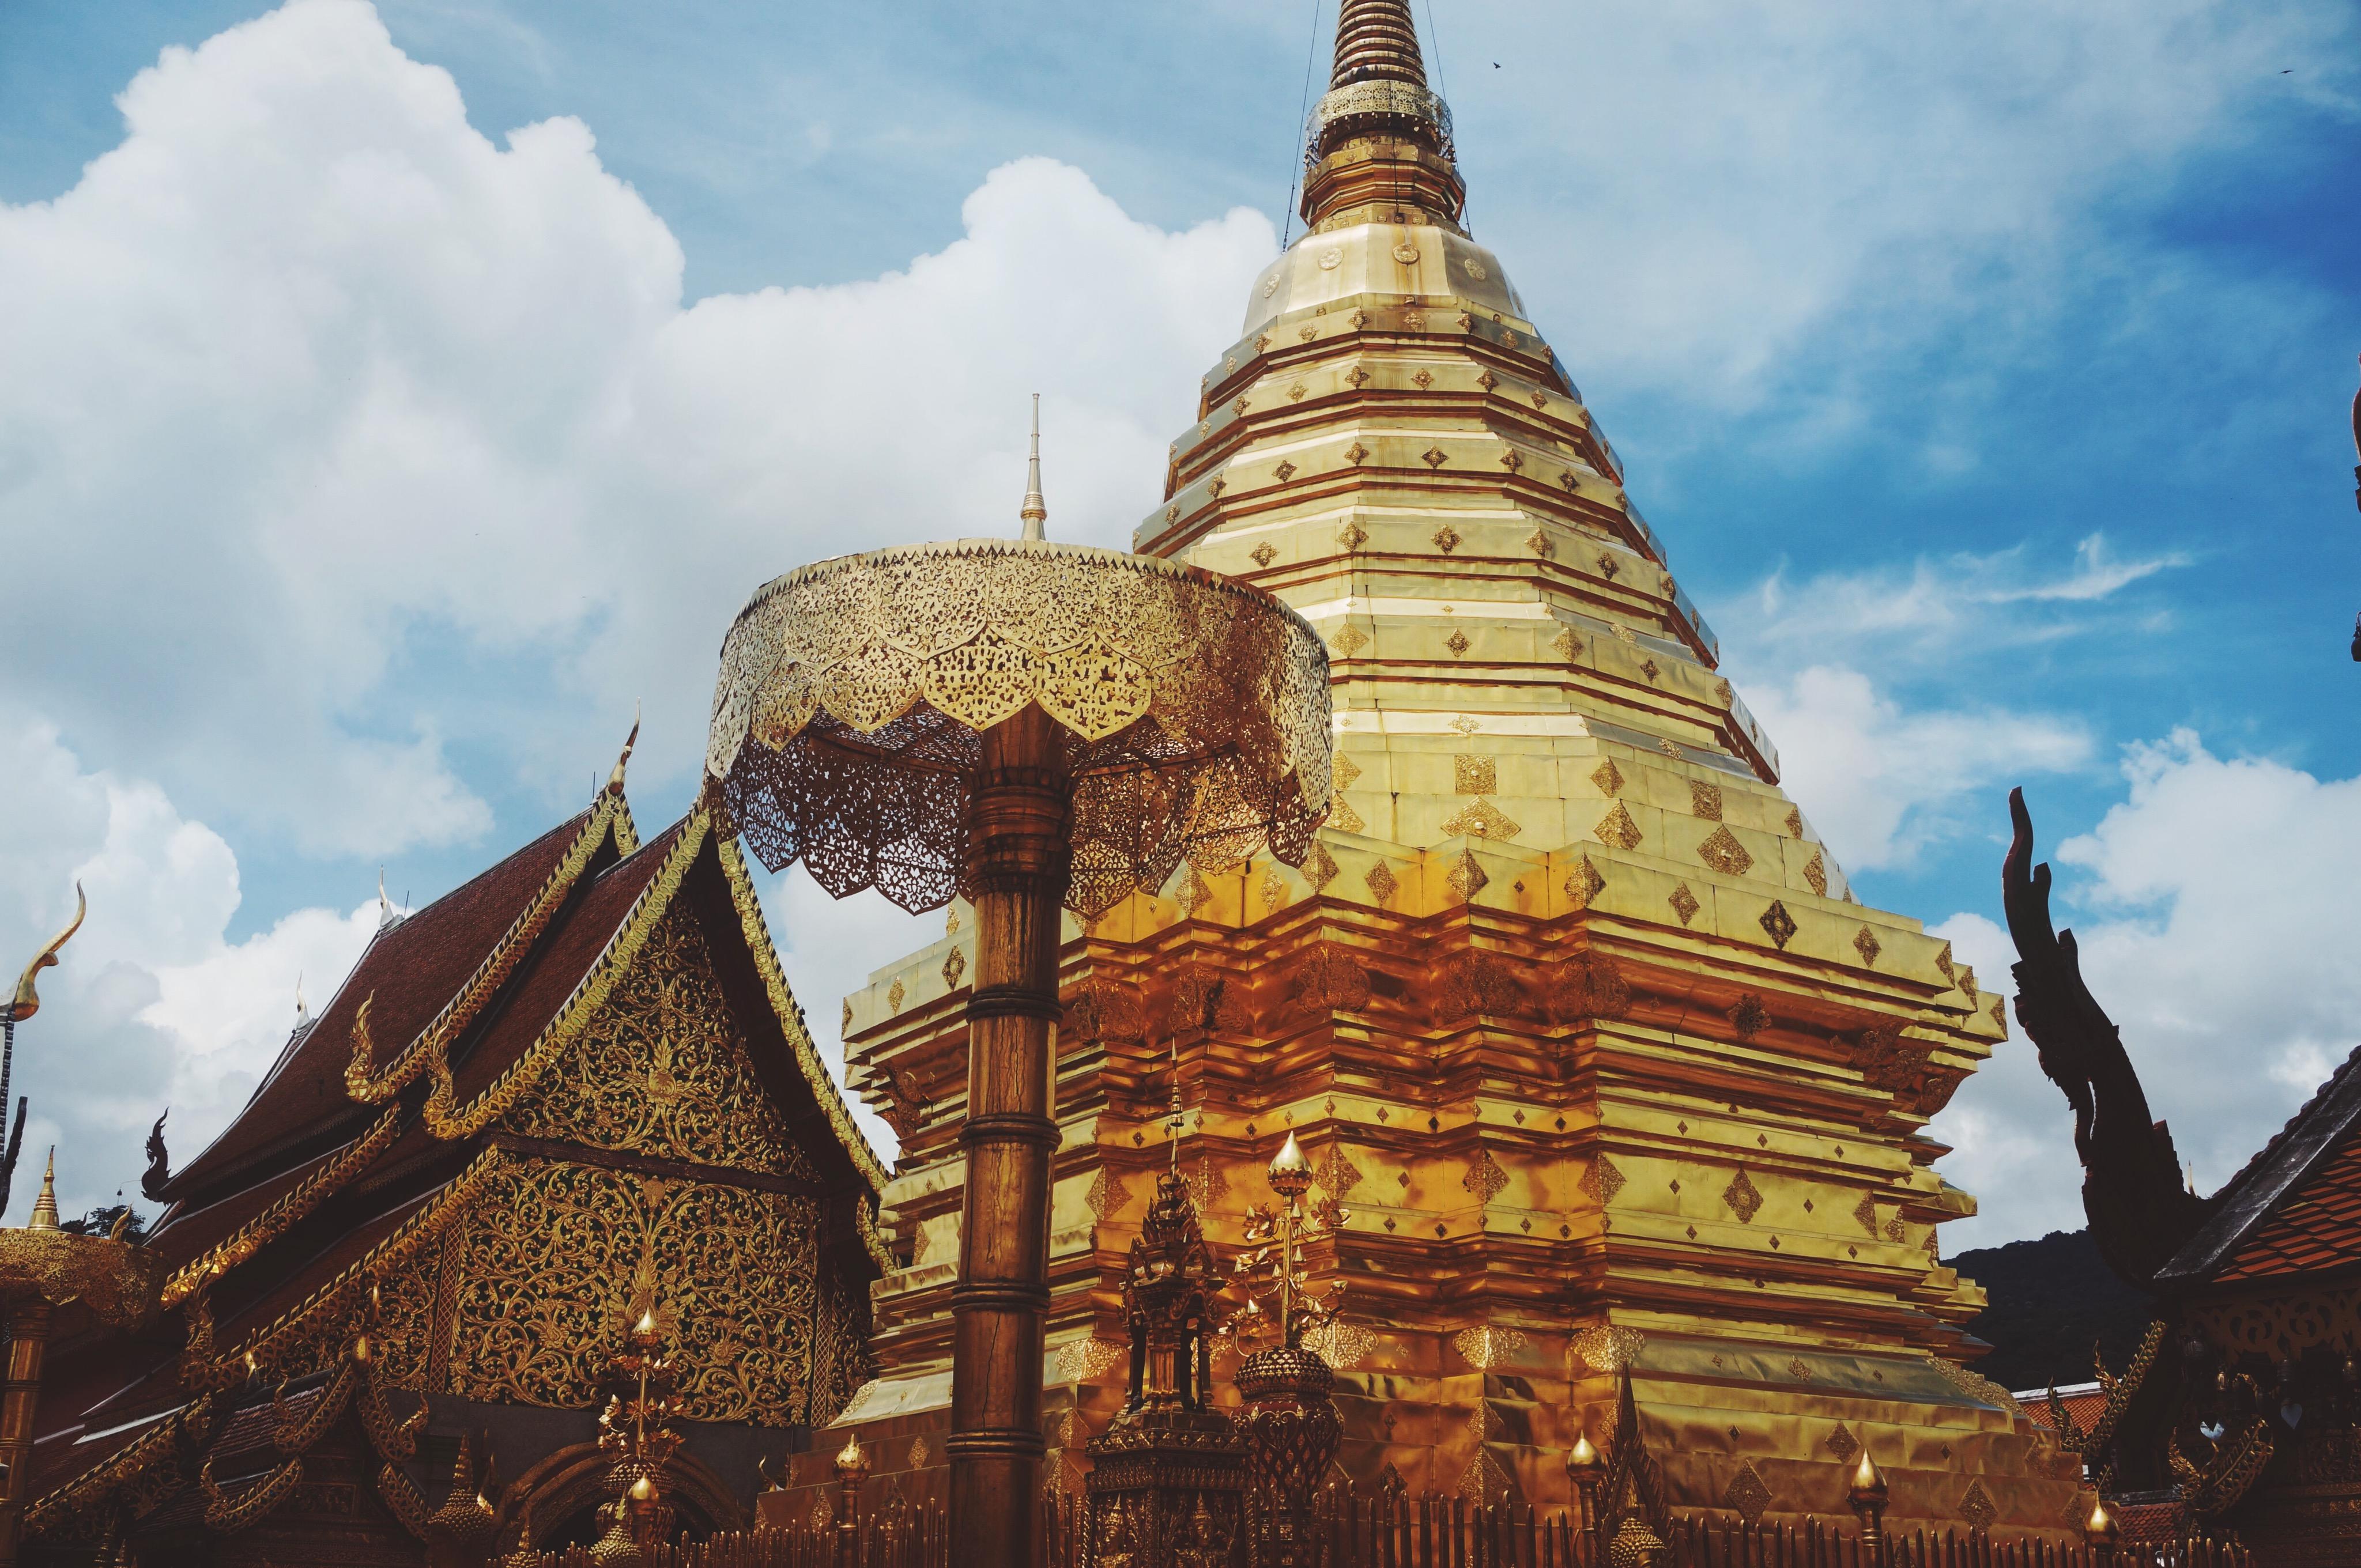 Doi Suthep Tempel in Thailand, Chiang Mai